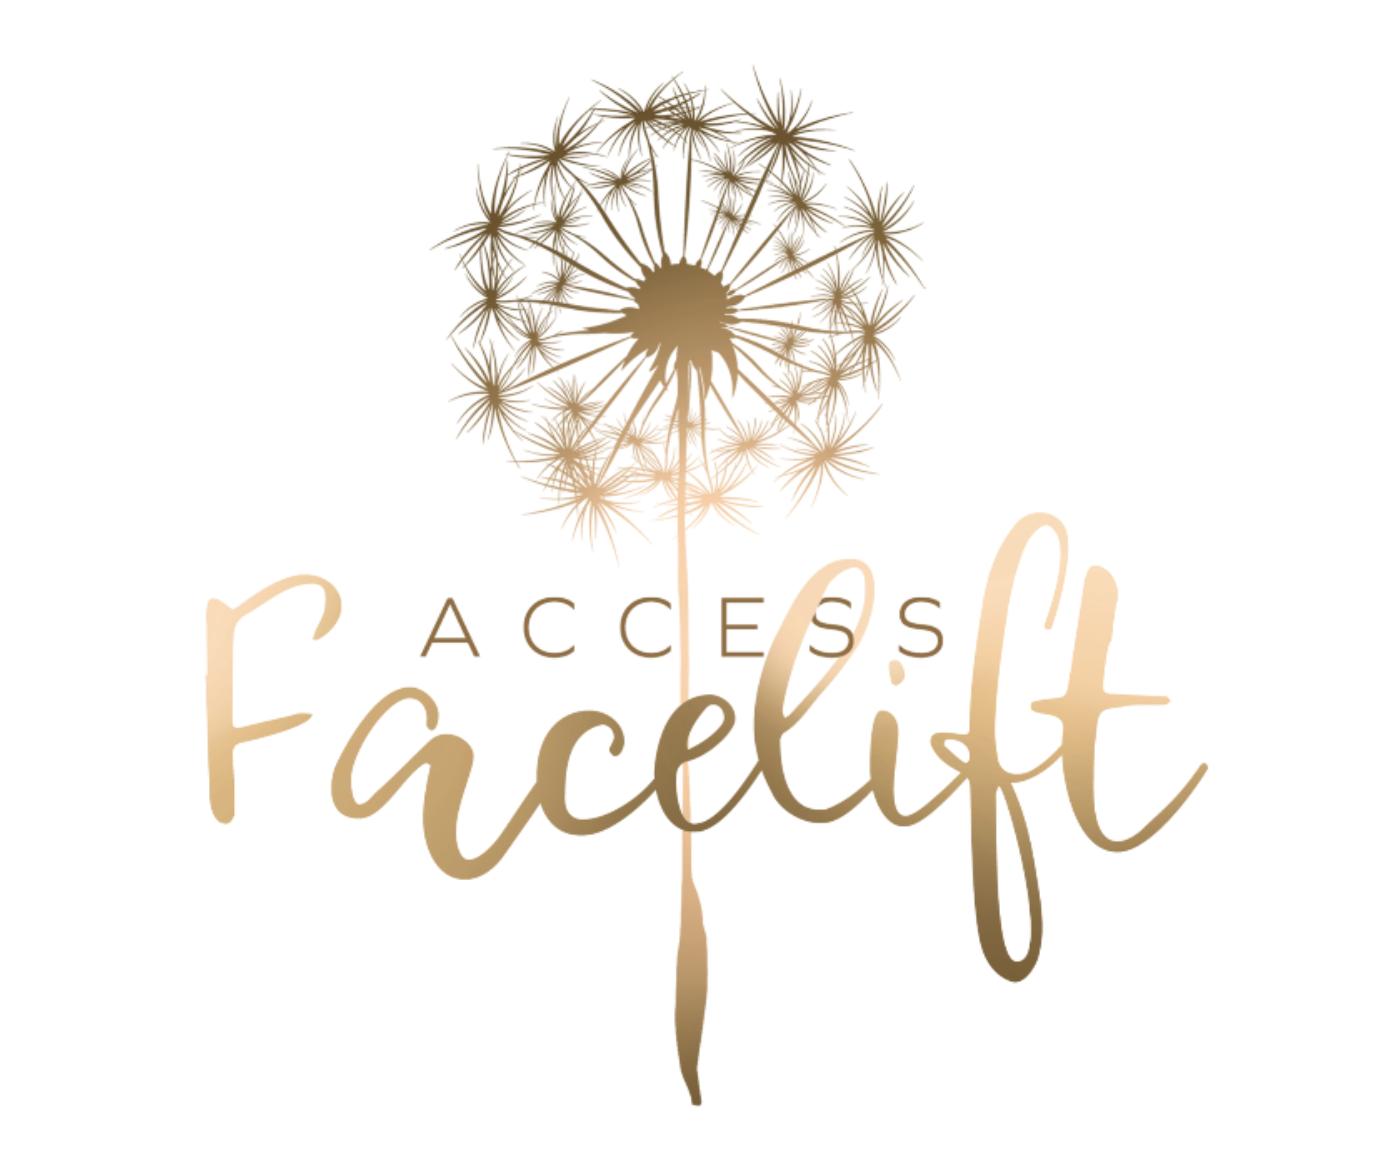 Modality access facelift